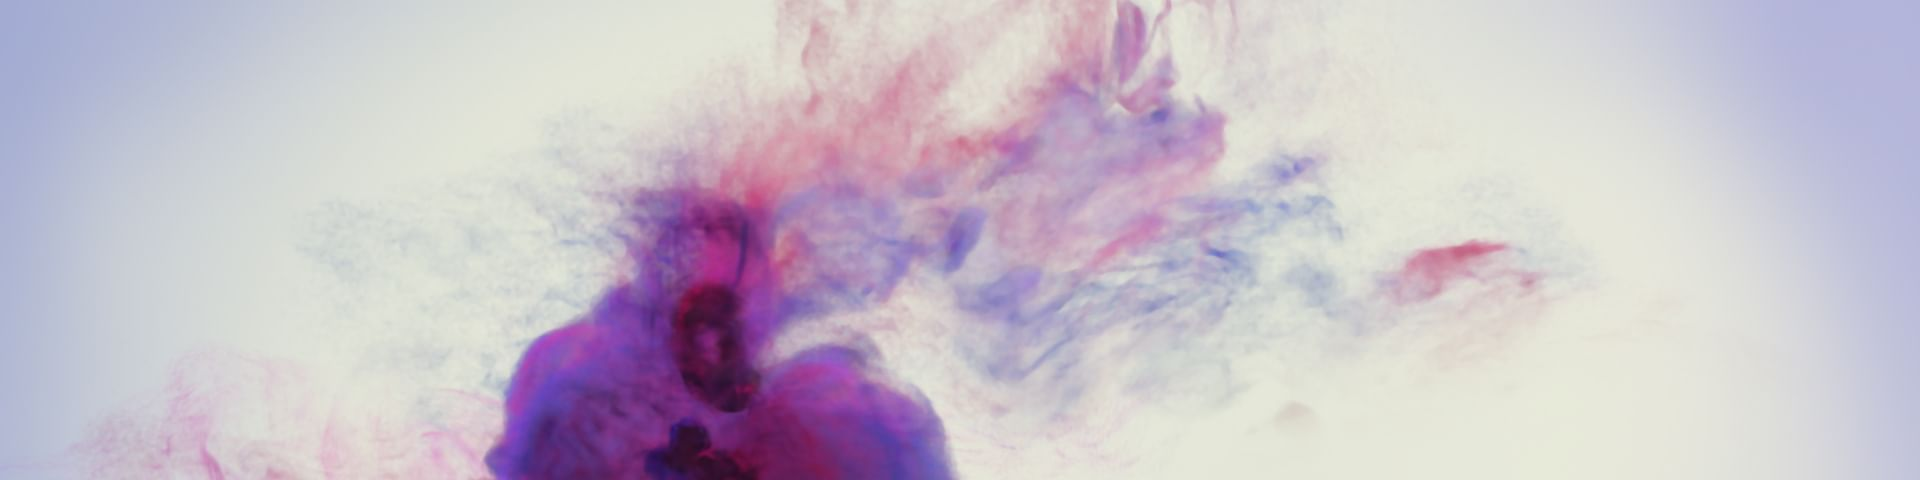 Venedig und das Ghetto